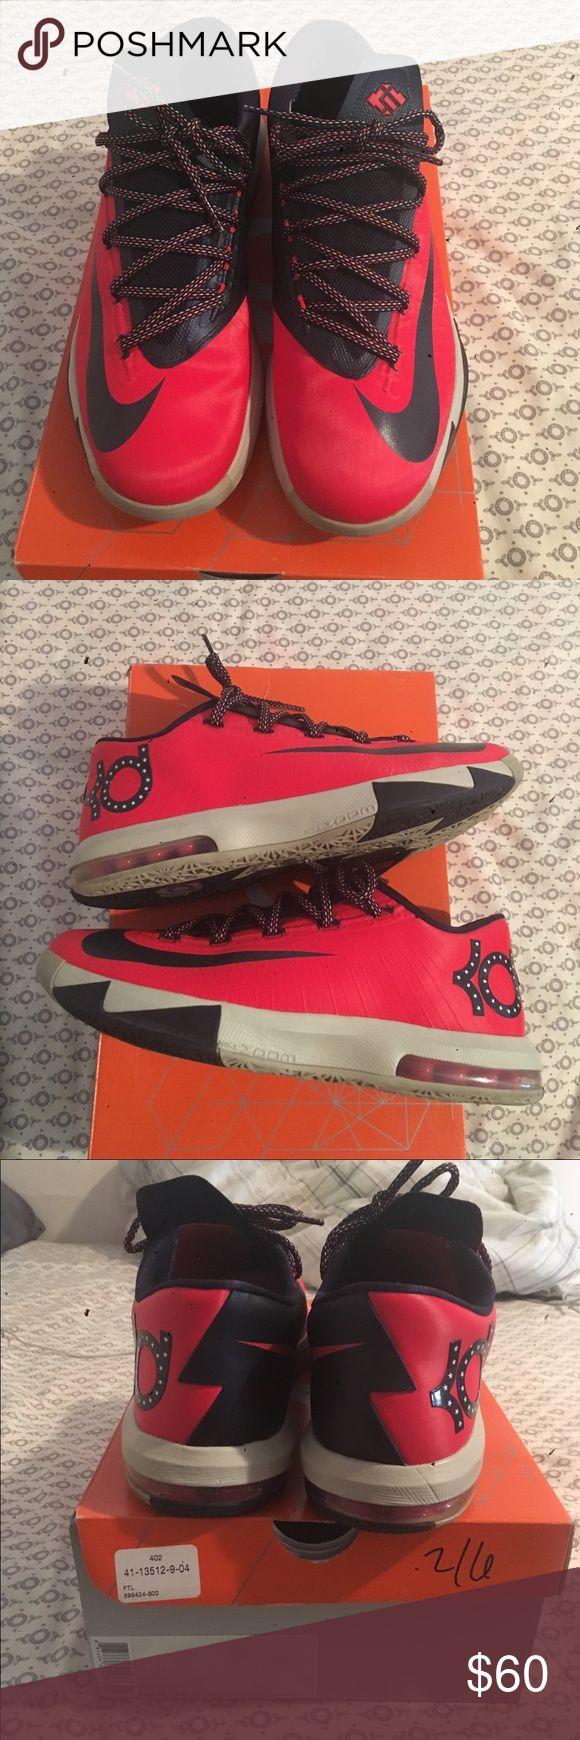 Nike KD VI Light Crimson/Crimson-Lt Bg Chlk-Ltl Used in great condition. Size 9.5 Nike KD VI Light Crimson/Crimson-Lt Bg Chlk-Ltl Nike Shoes Sneakers